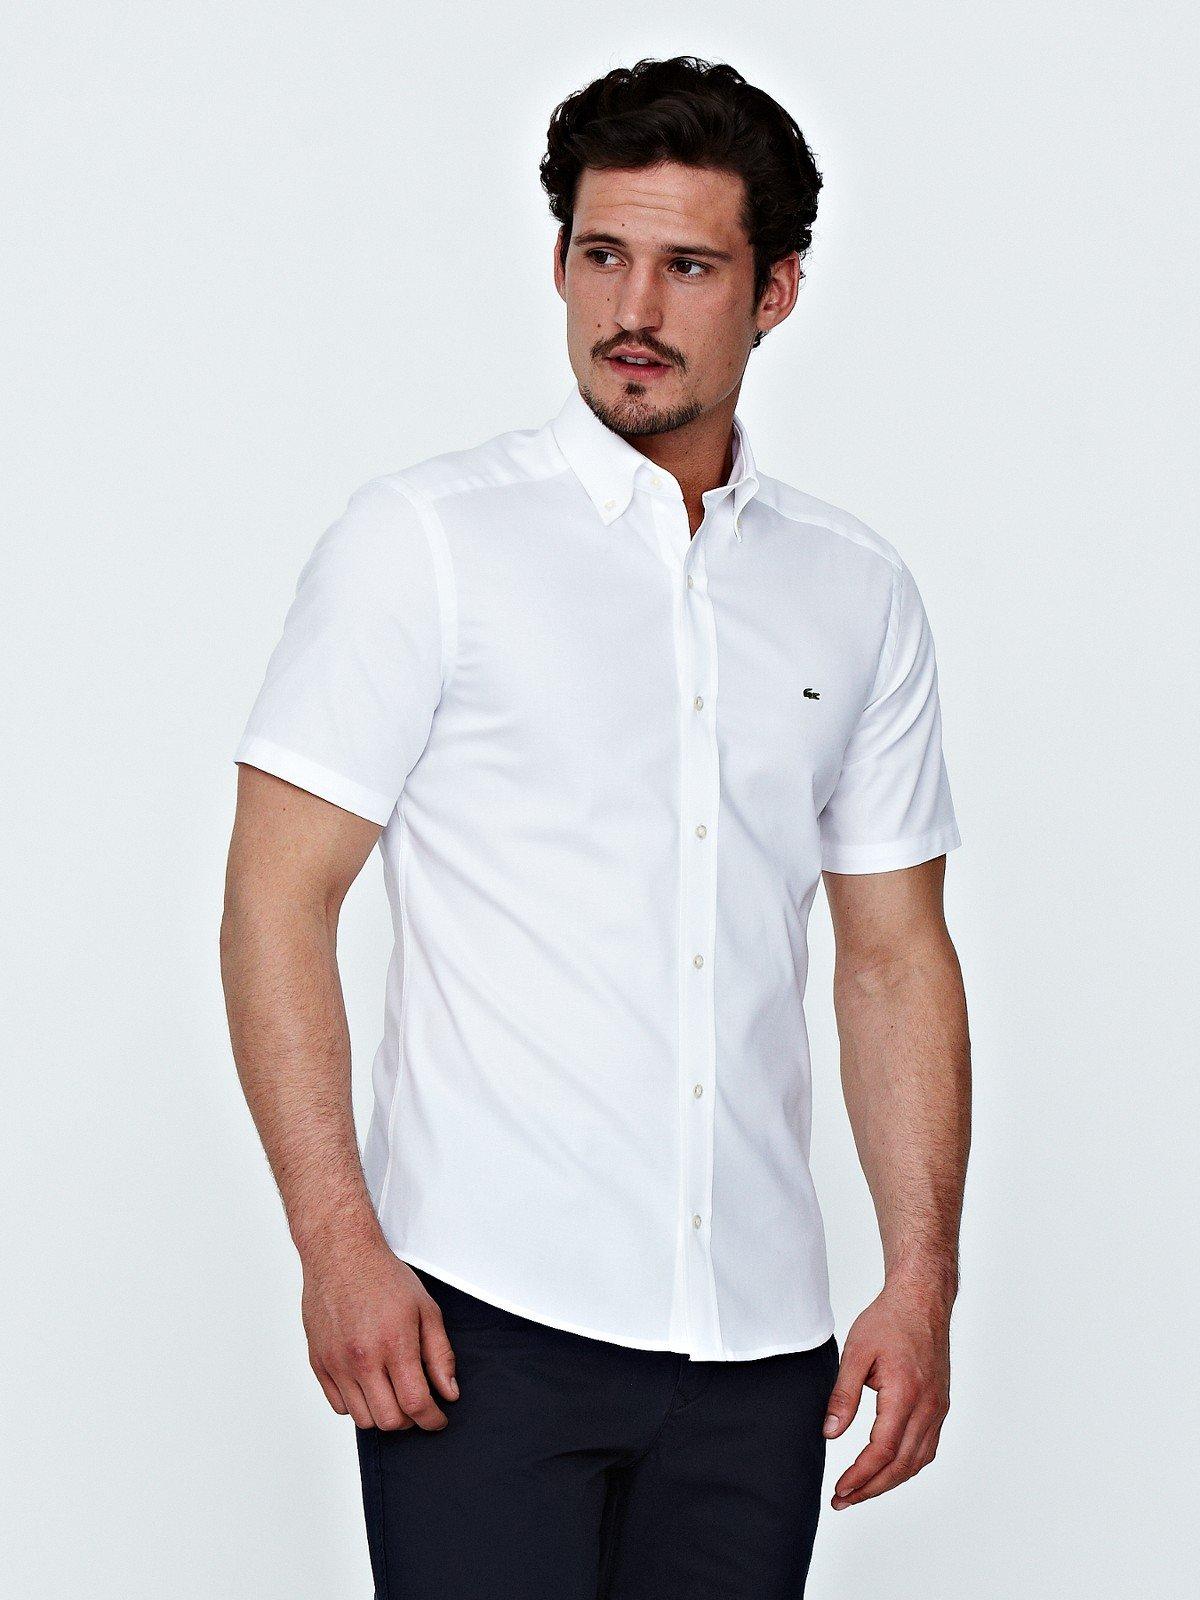 Lacoste Mens Short Sleeve Oxford Shirt In White For Men Lyst